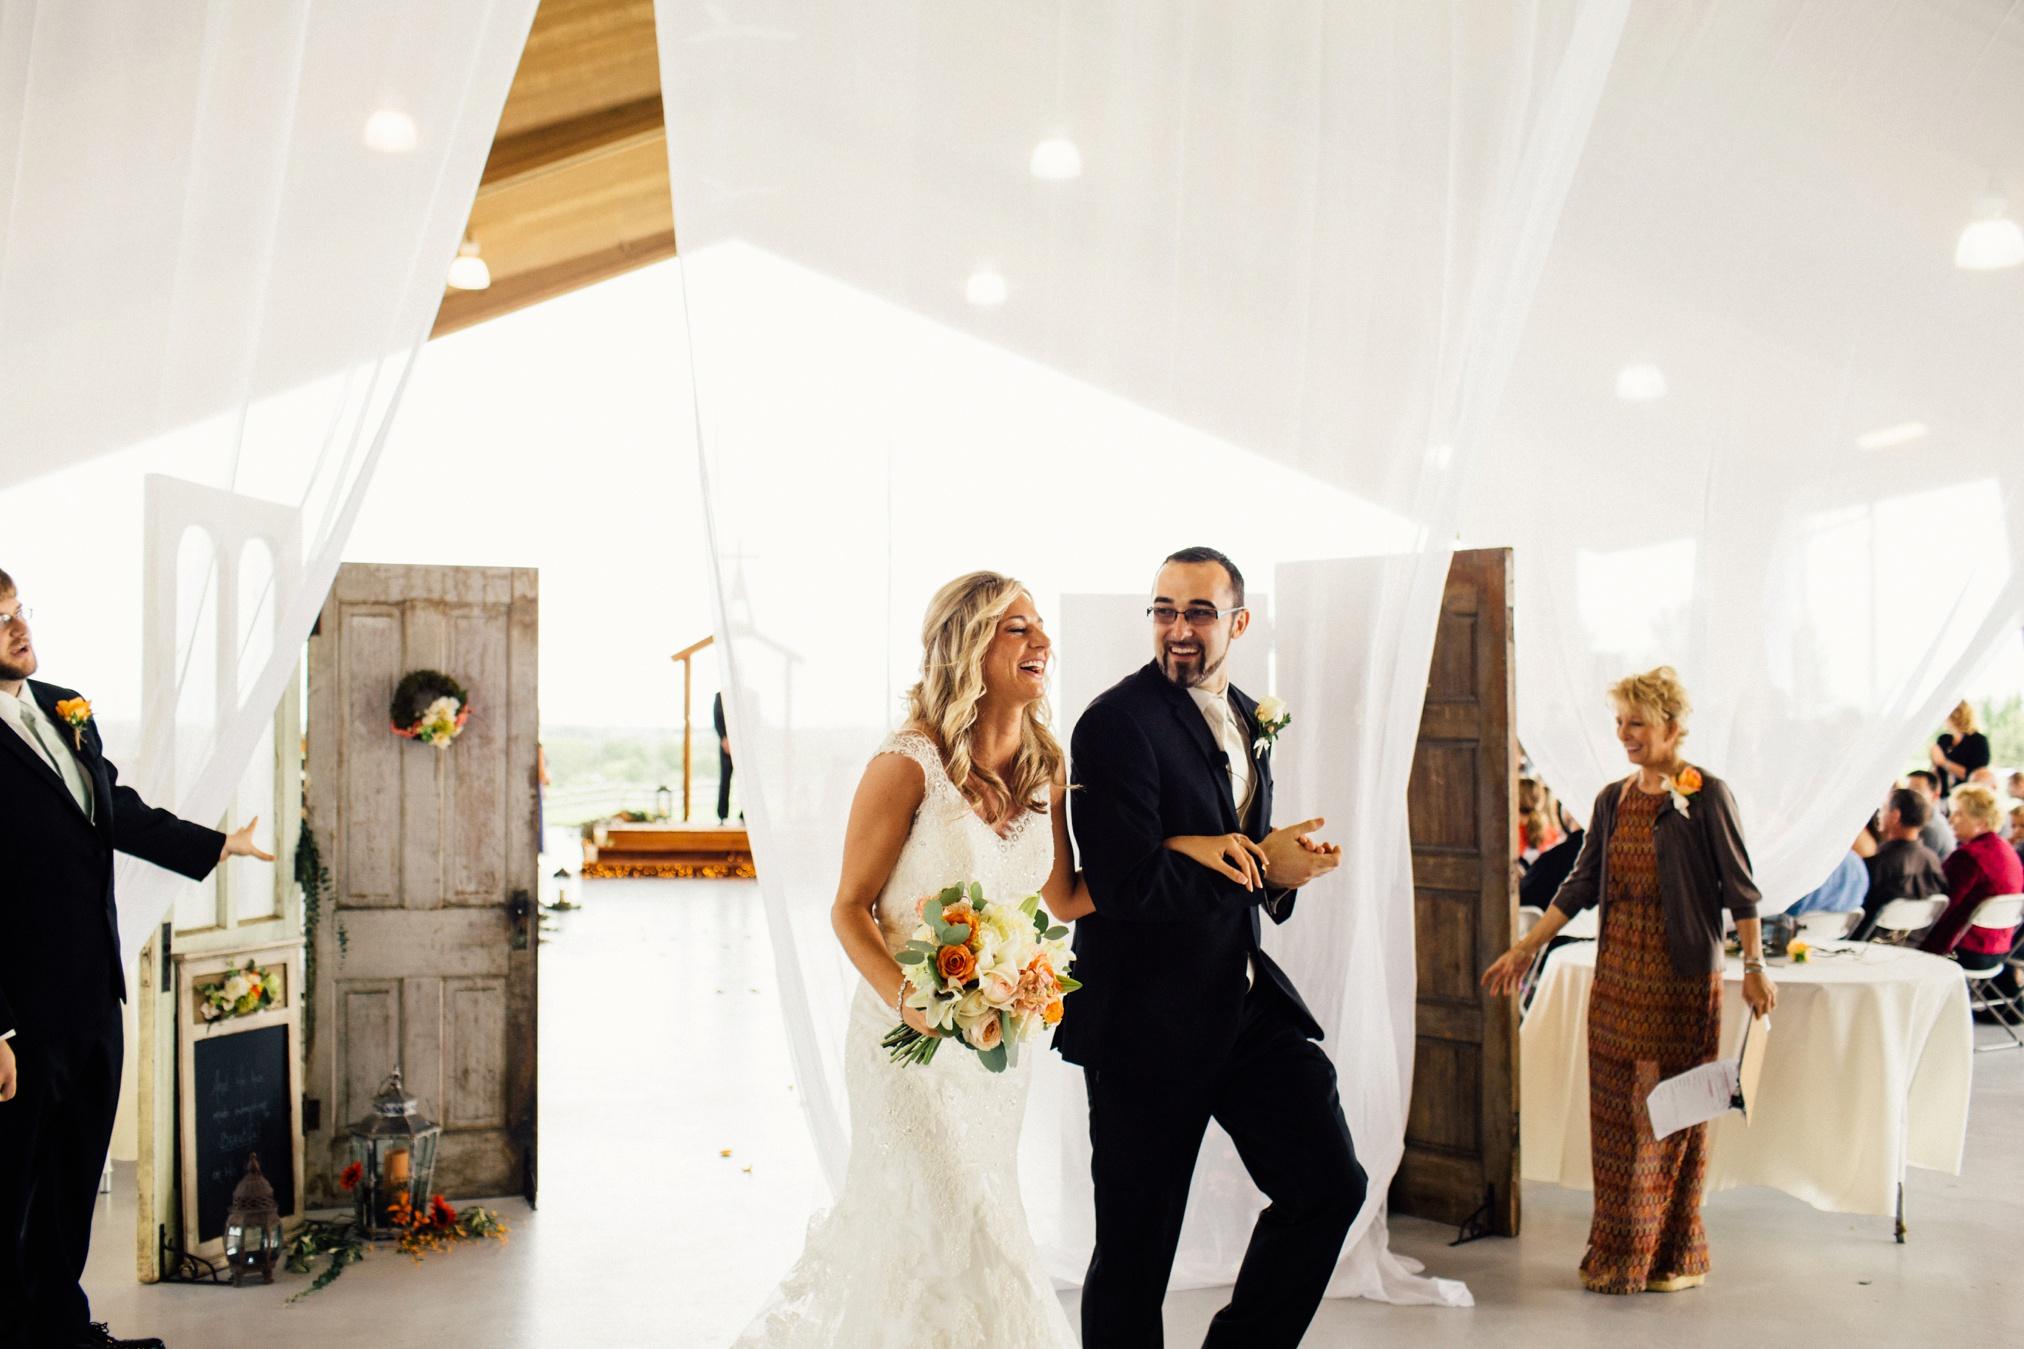 schmid_wedding-571.jpg